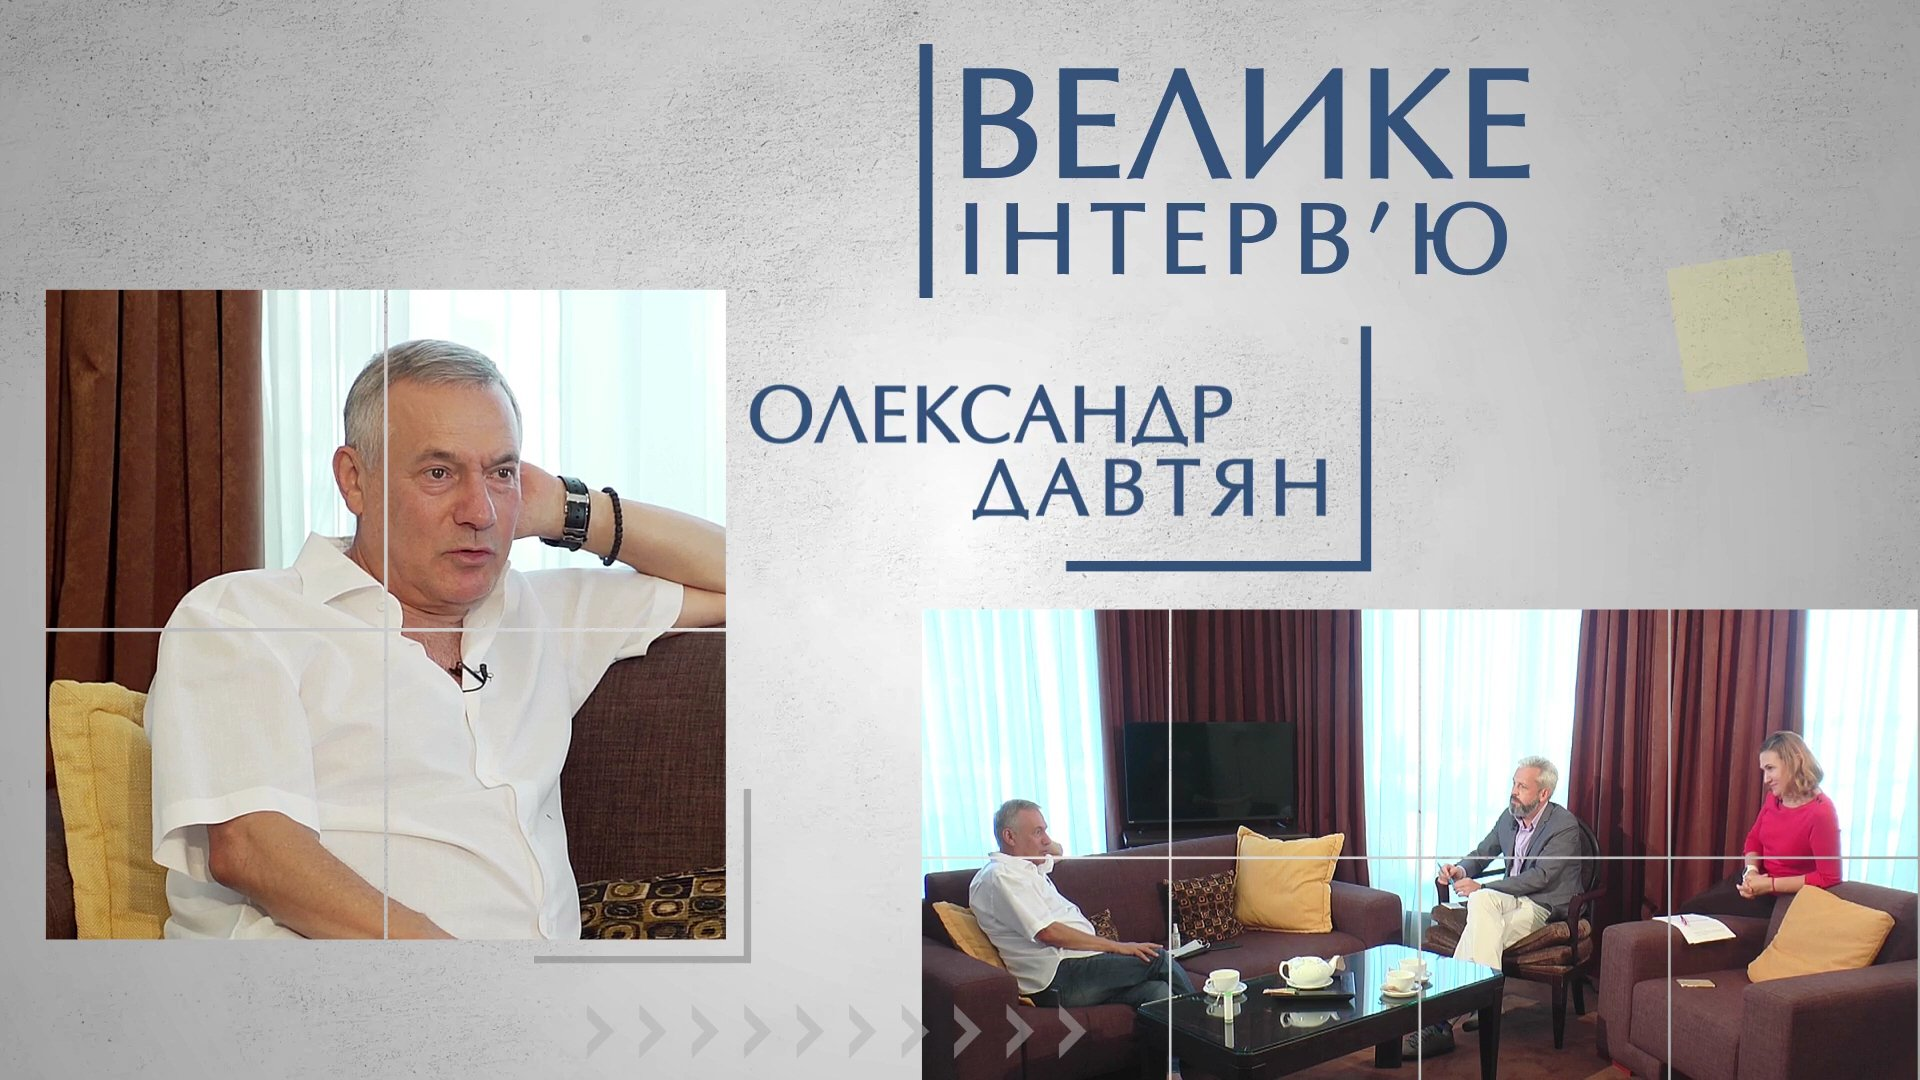 Велике інтерв'ю: Олександр Давтян